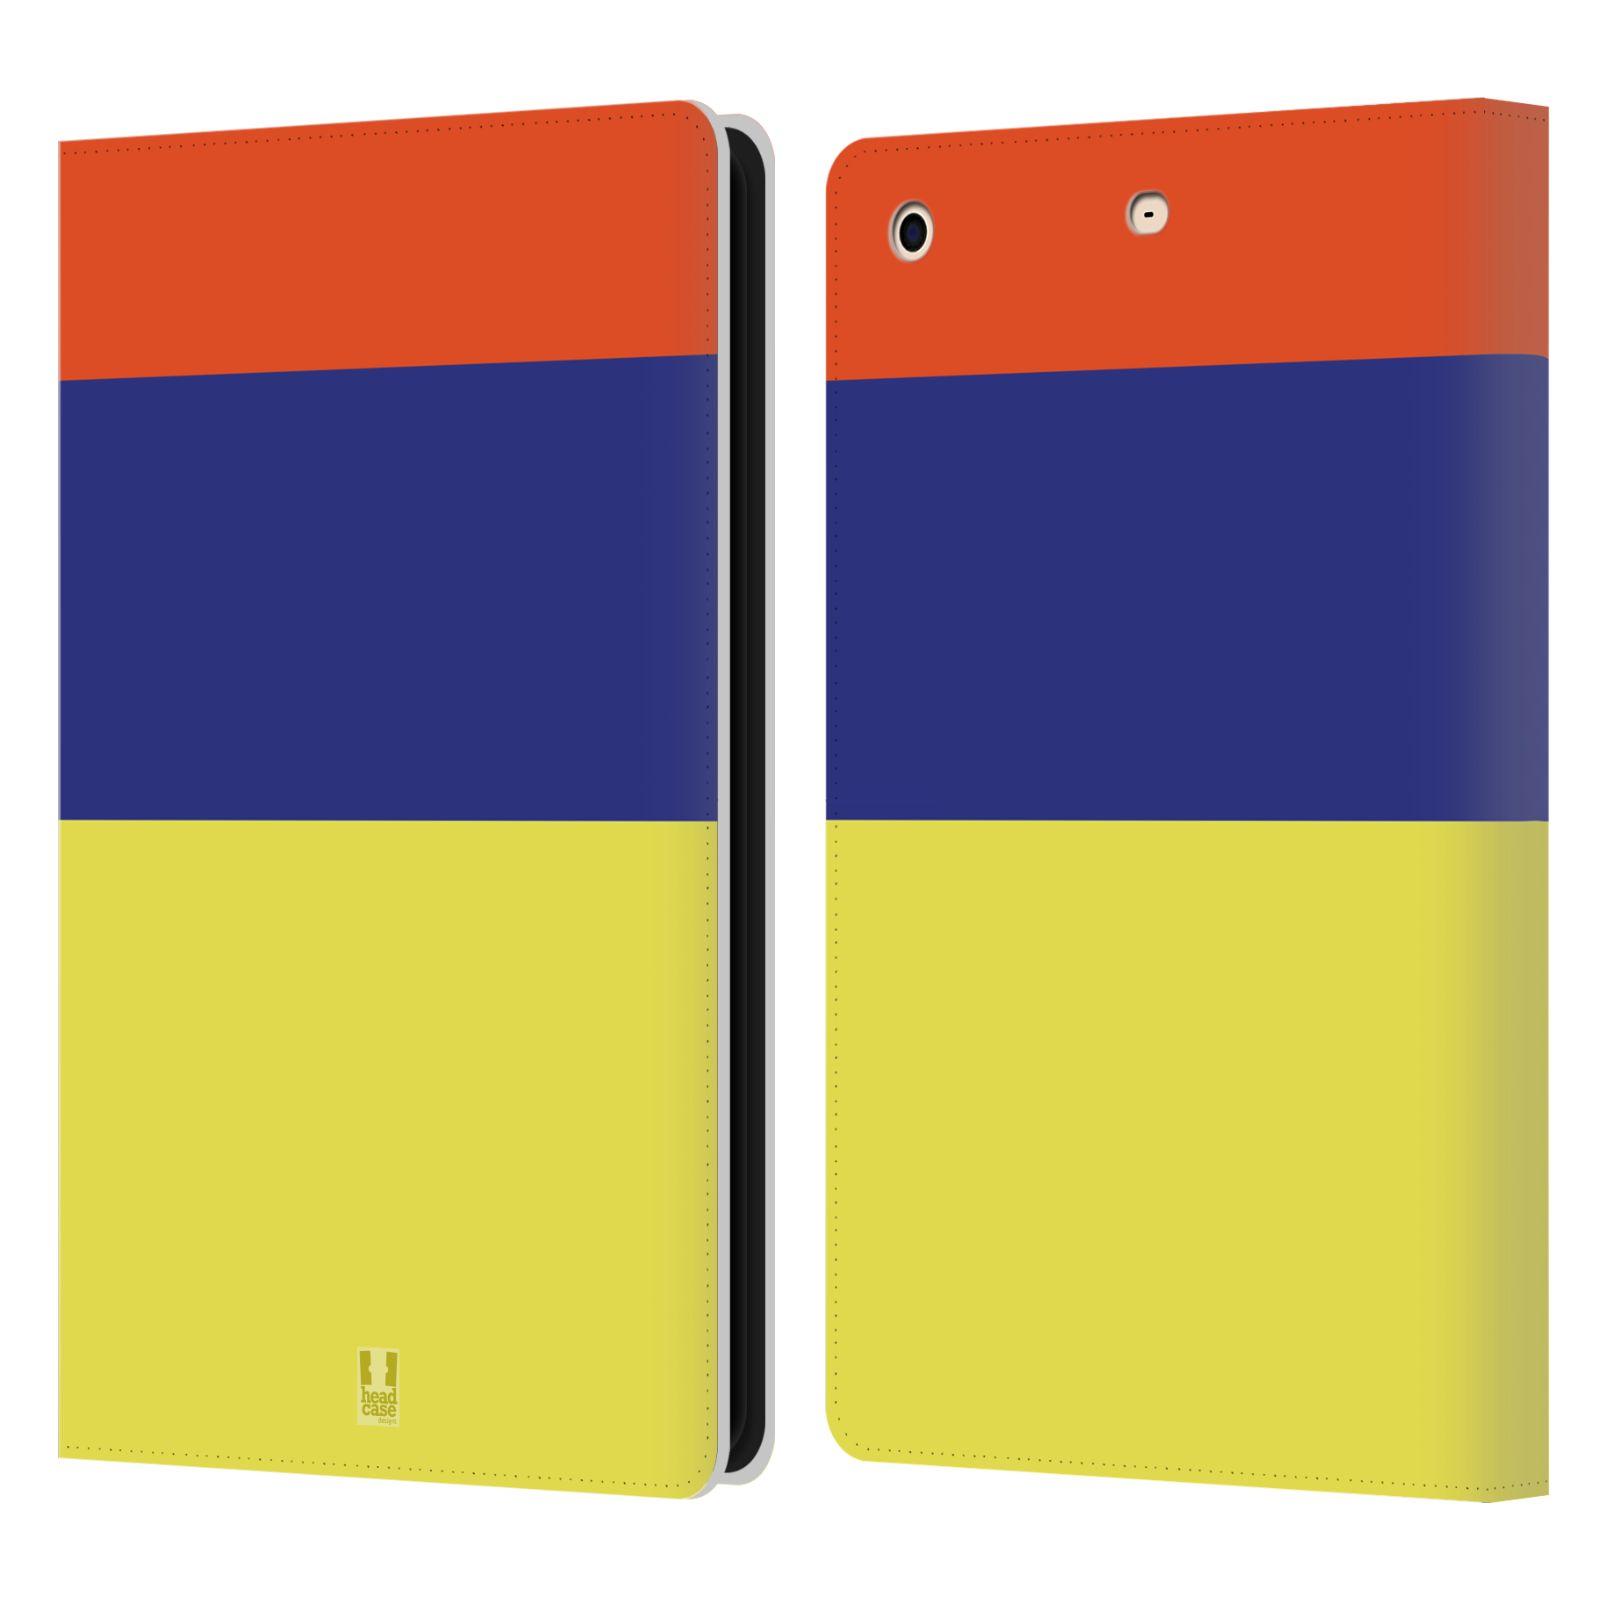 HEAD CASE Flipové pouzdro pro tablet Apple iPad mini barevné tvary žlutá, modrá, červená